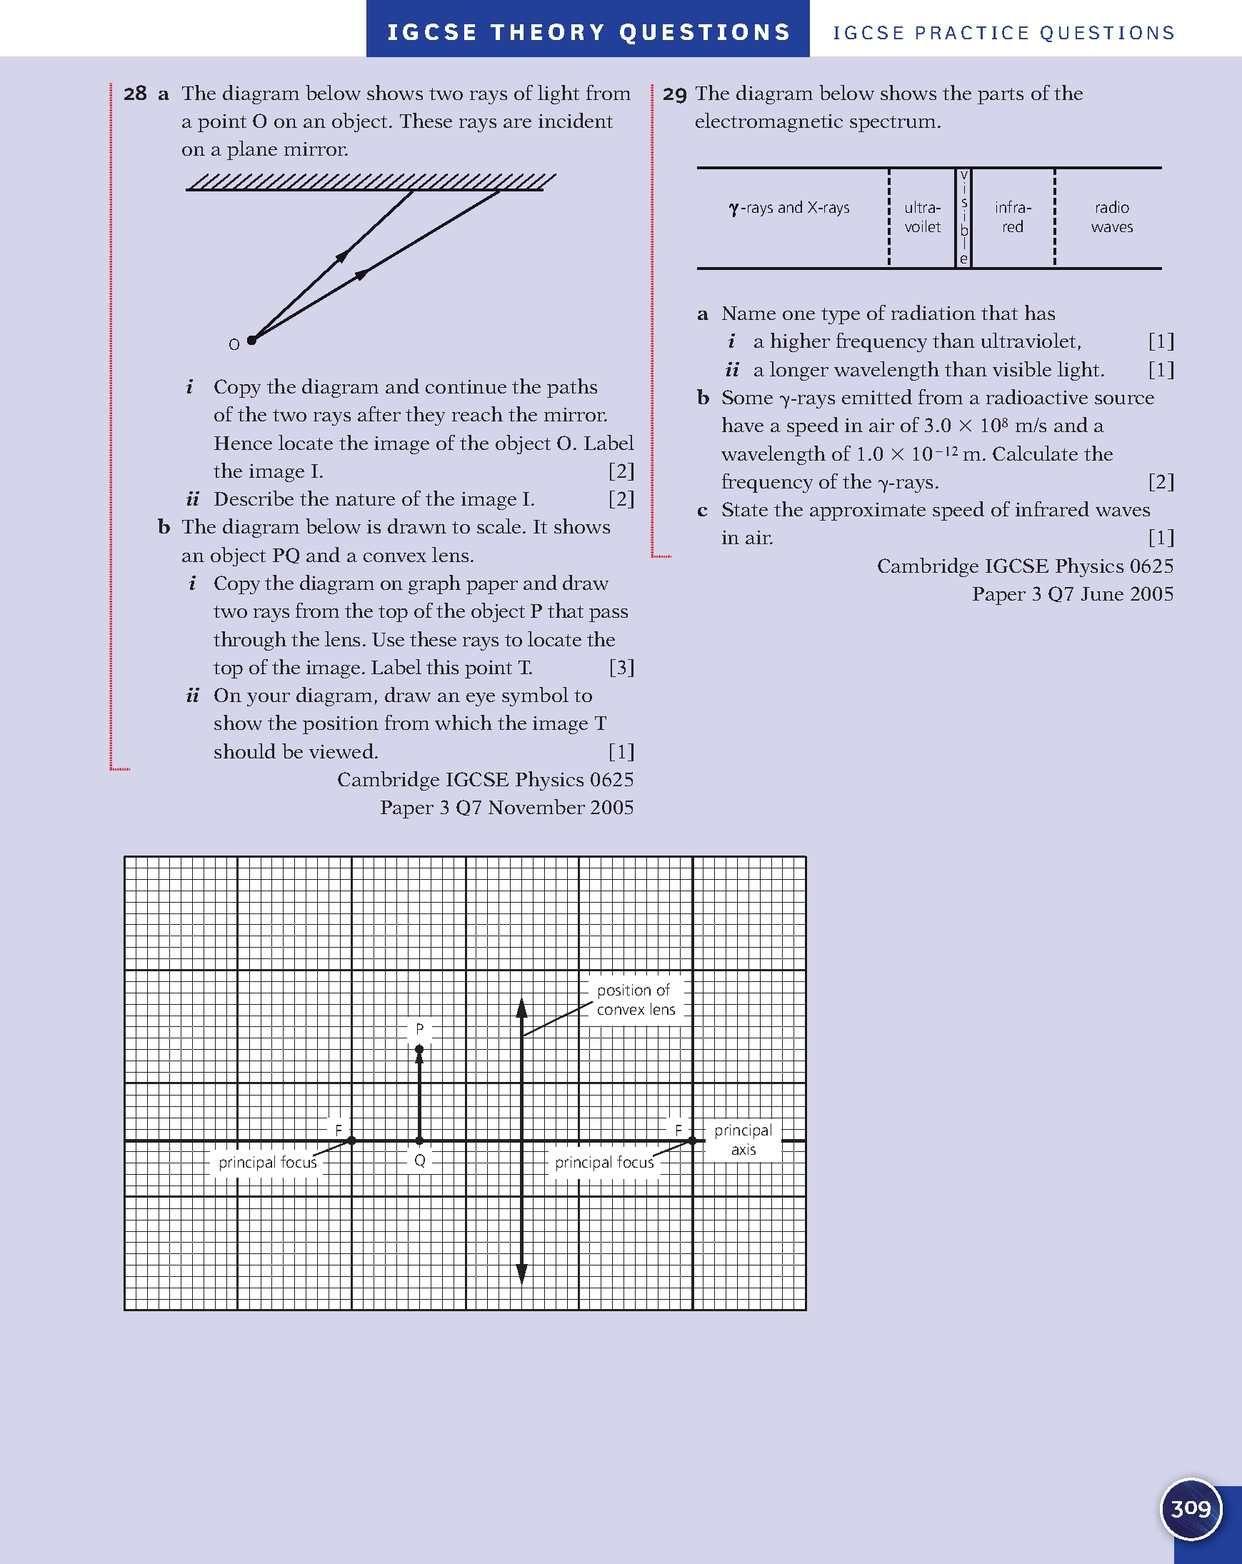 Complete Physics For Cambridge Igcse Calameo Pdf Download Physics Books Cambridge Igcse Physics